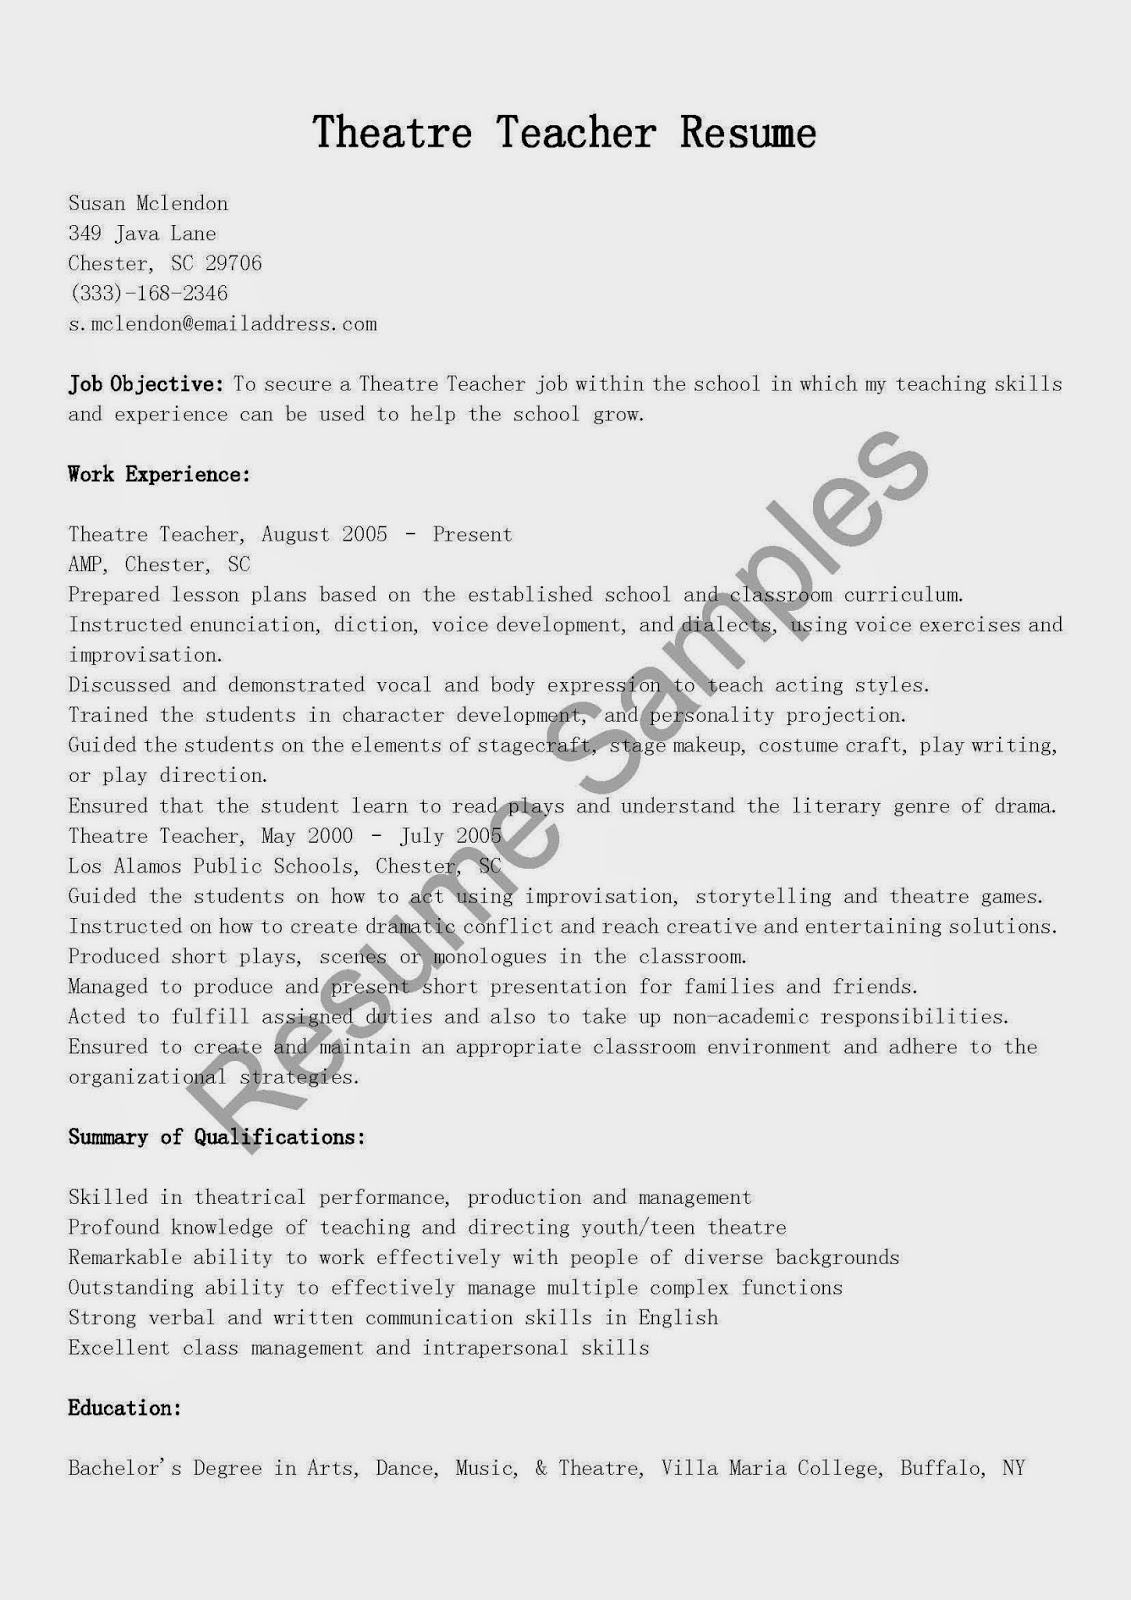 resume samples  theatre teacher resume sample